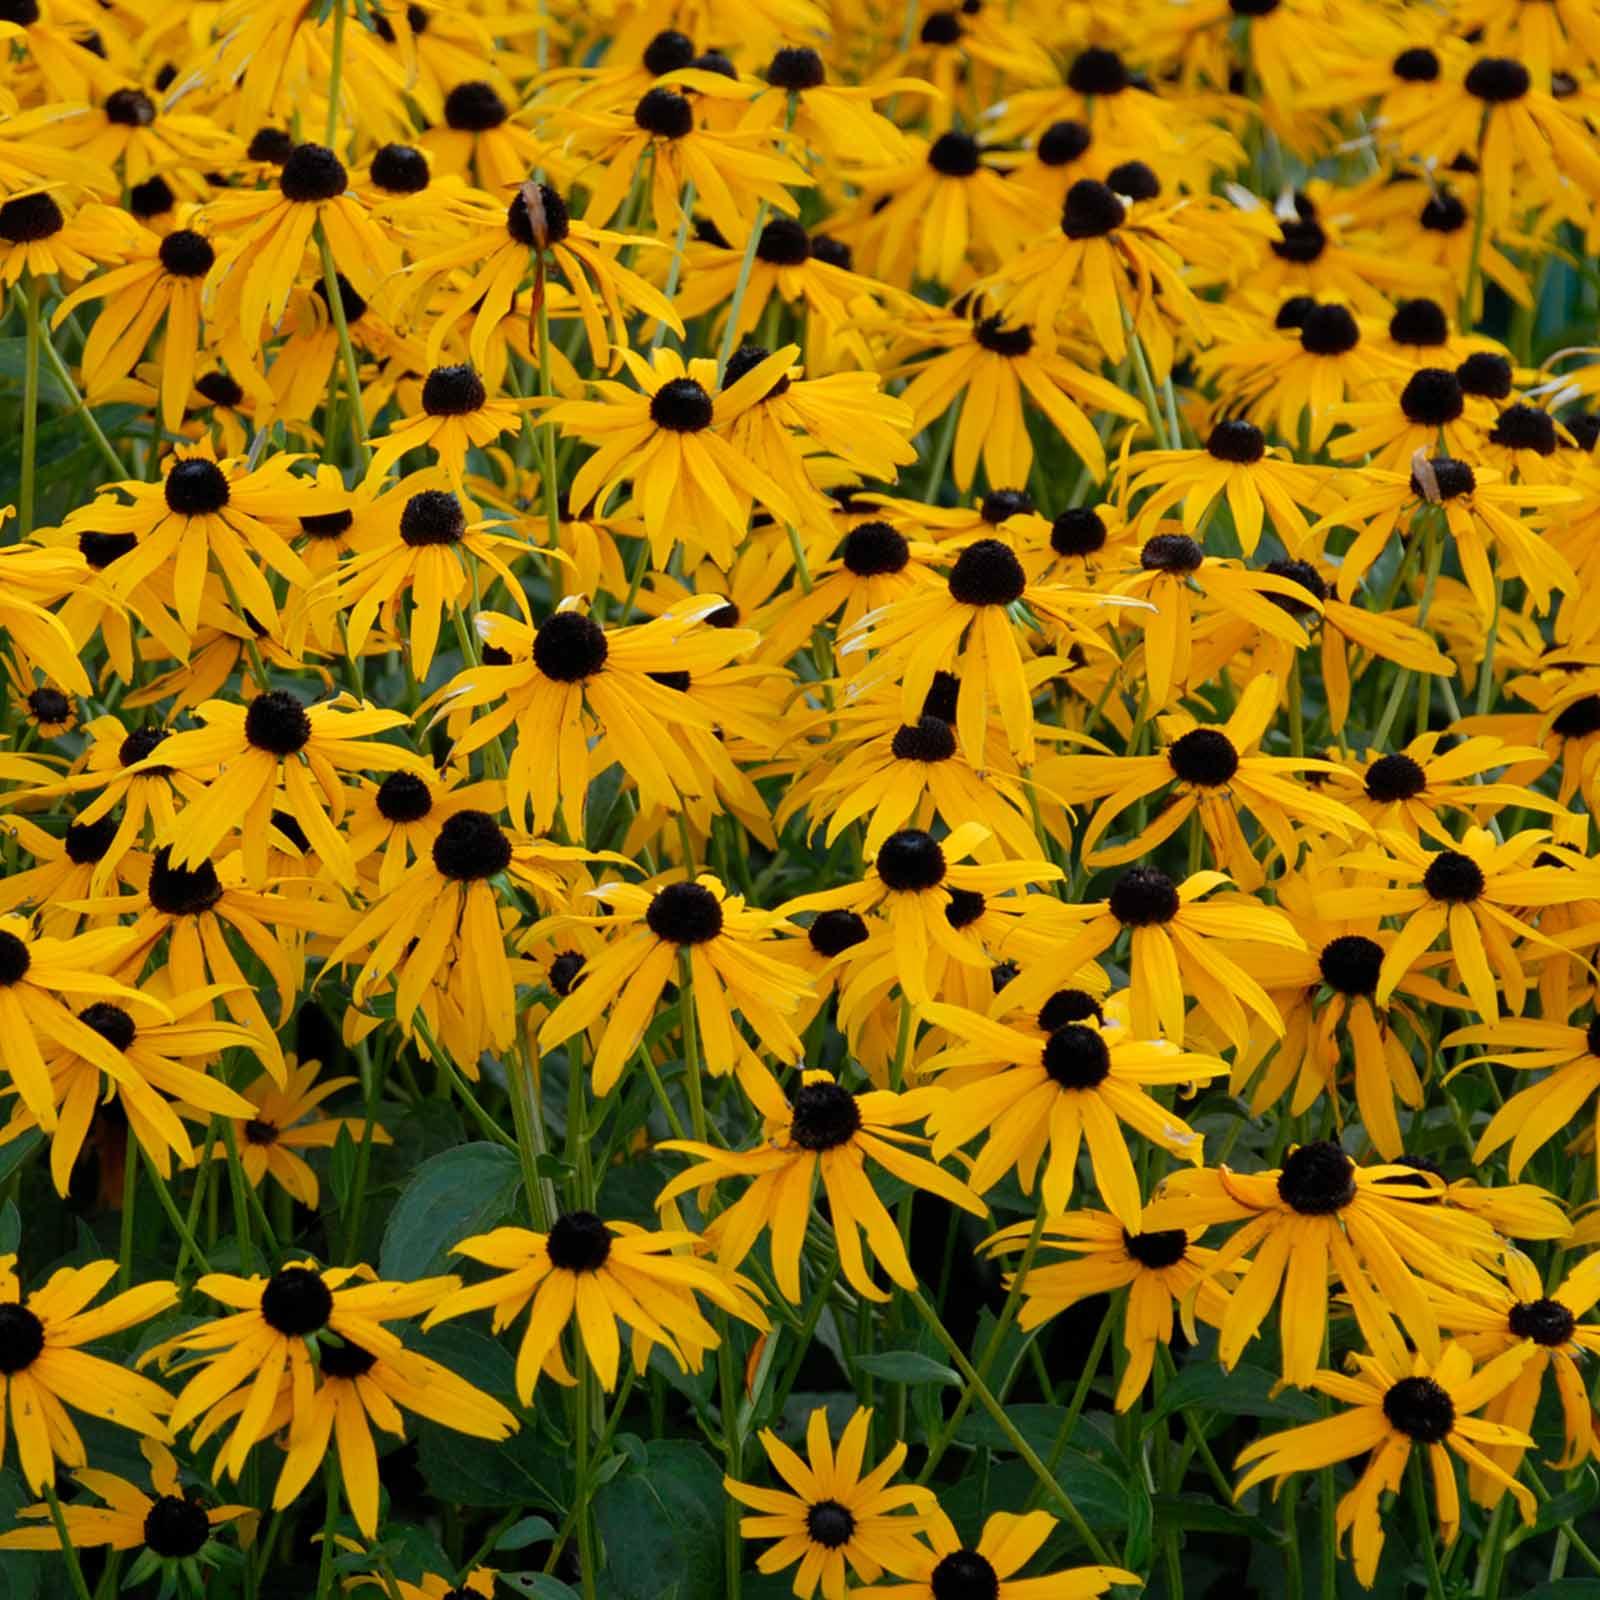 Rudbeckia Black Eyed Susan Seeds Goldsturm Sunset 500 Seeds